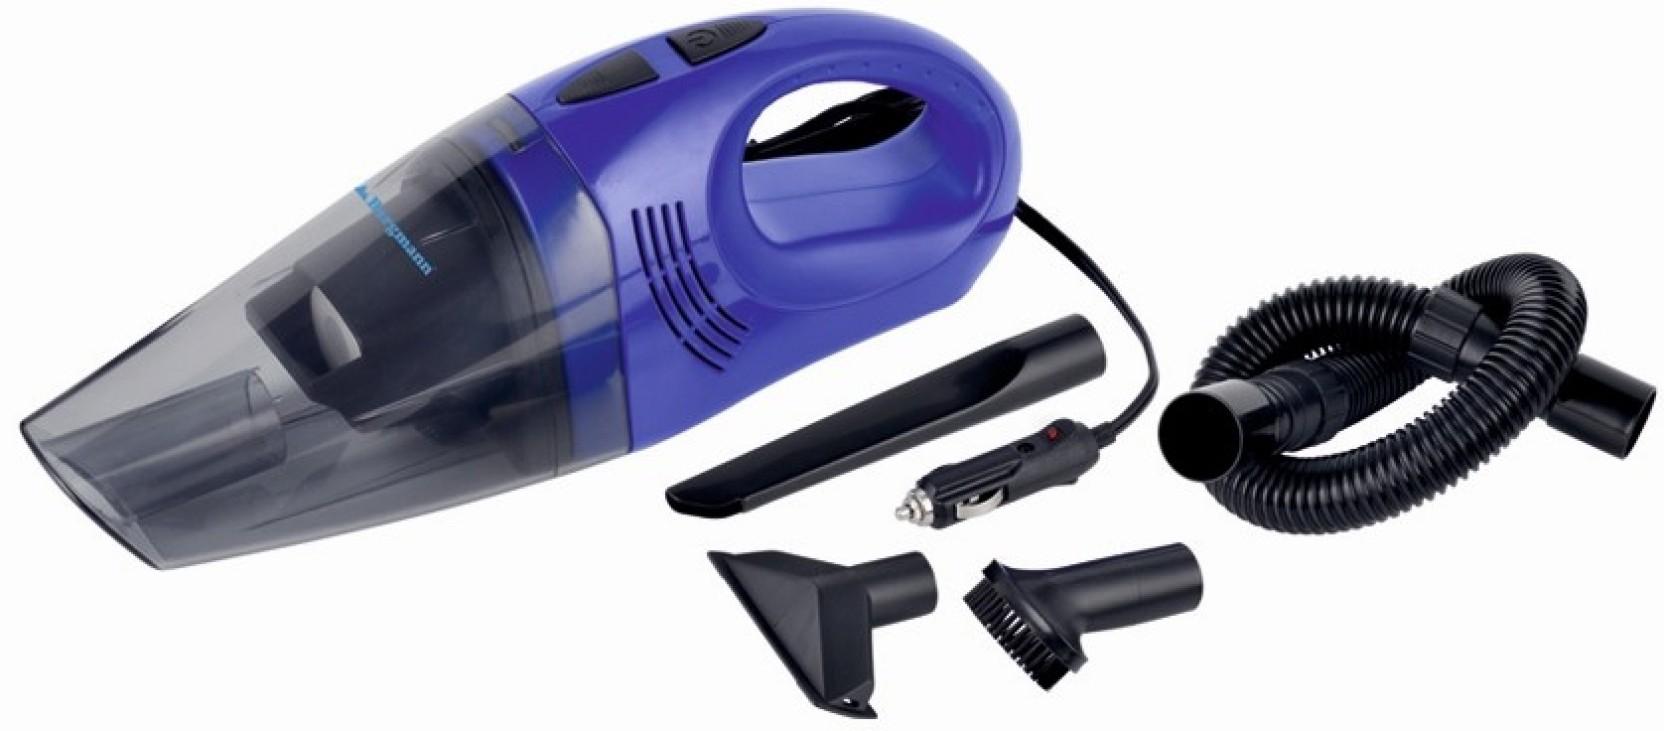 bergmann hurricane car vacuum cleaner price in india buy bergmann hurricane car vacuum cleaner. Black Bedroom Furniture Sets. Home Design Ideas